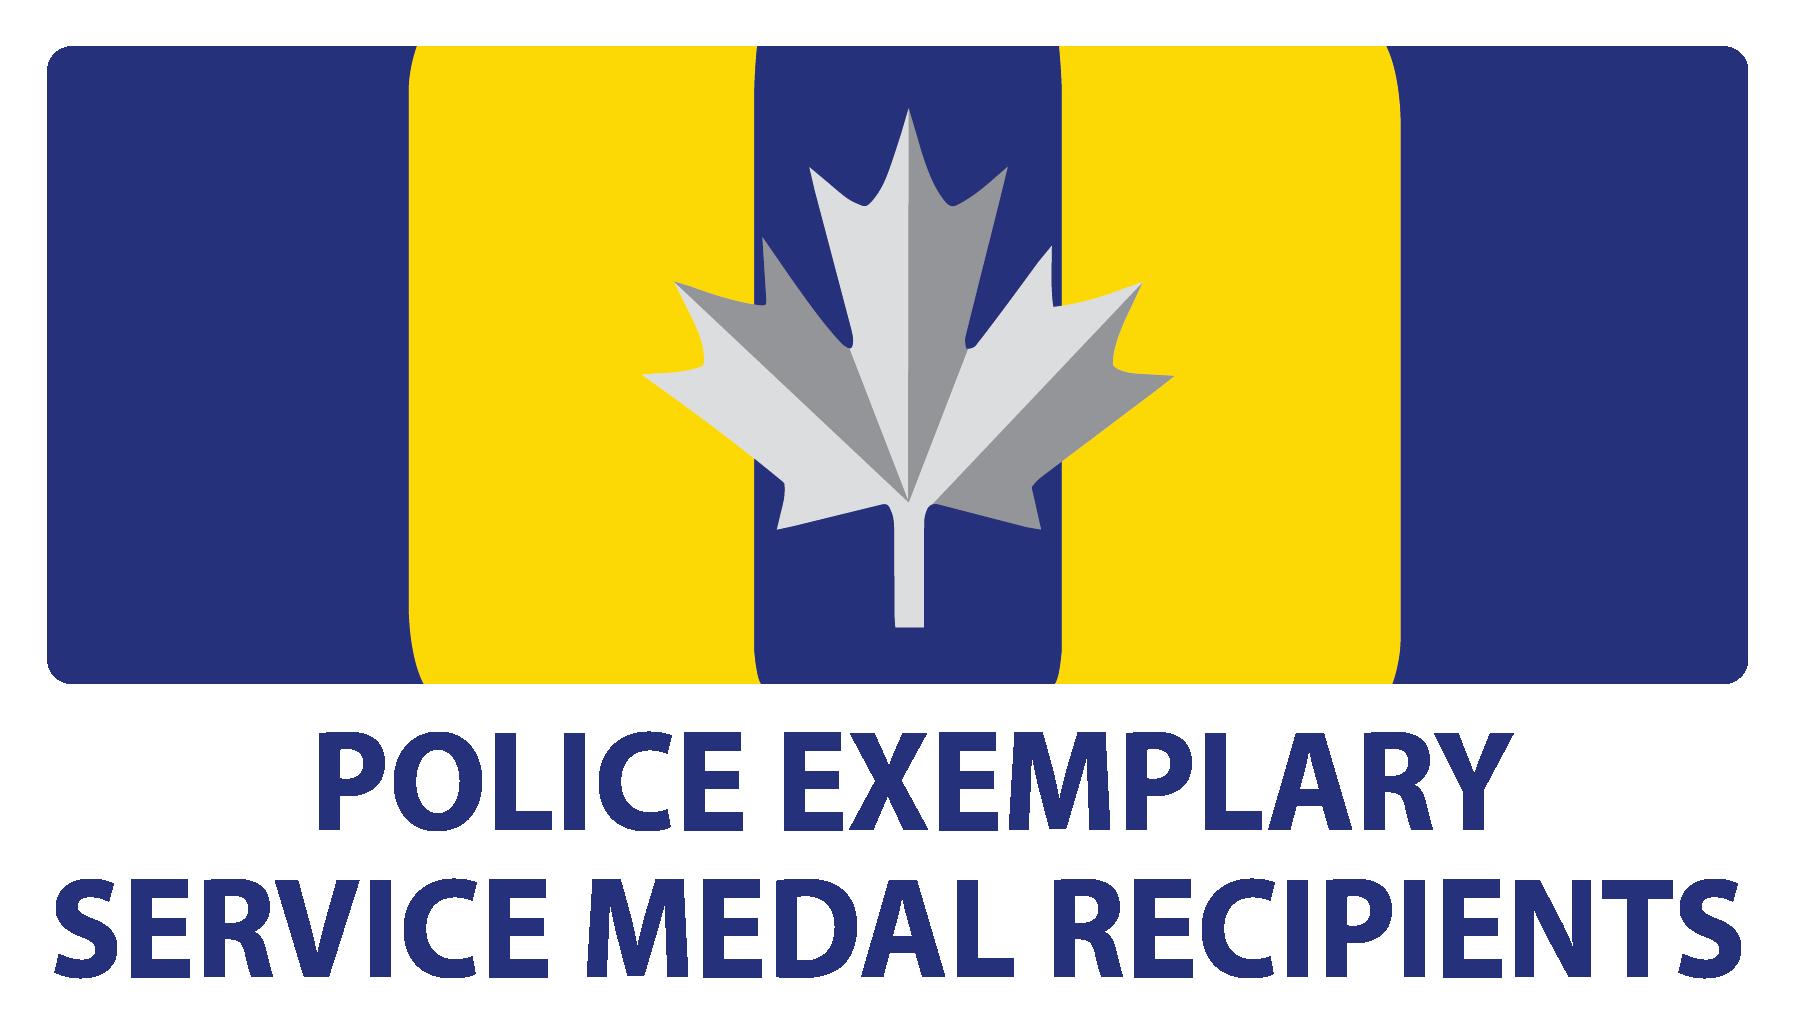 policeexemplary service medal.jpg